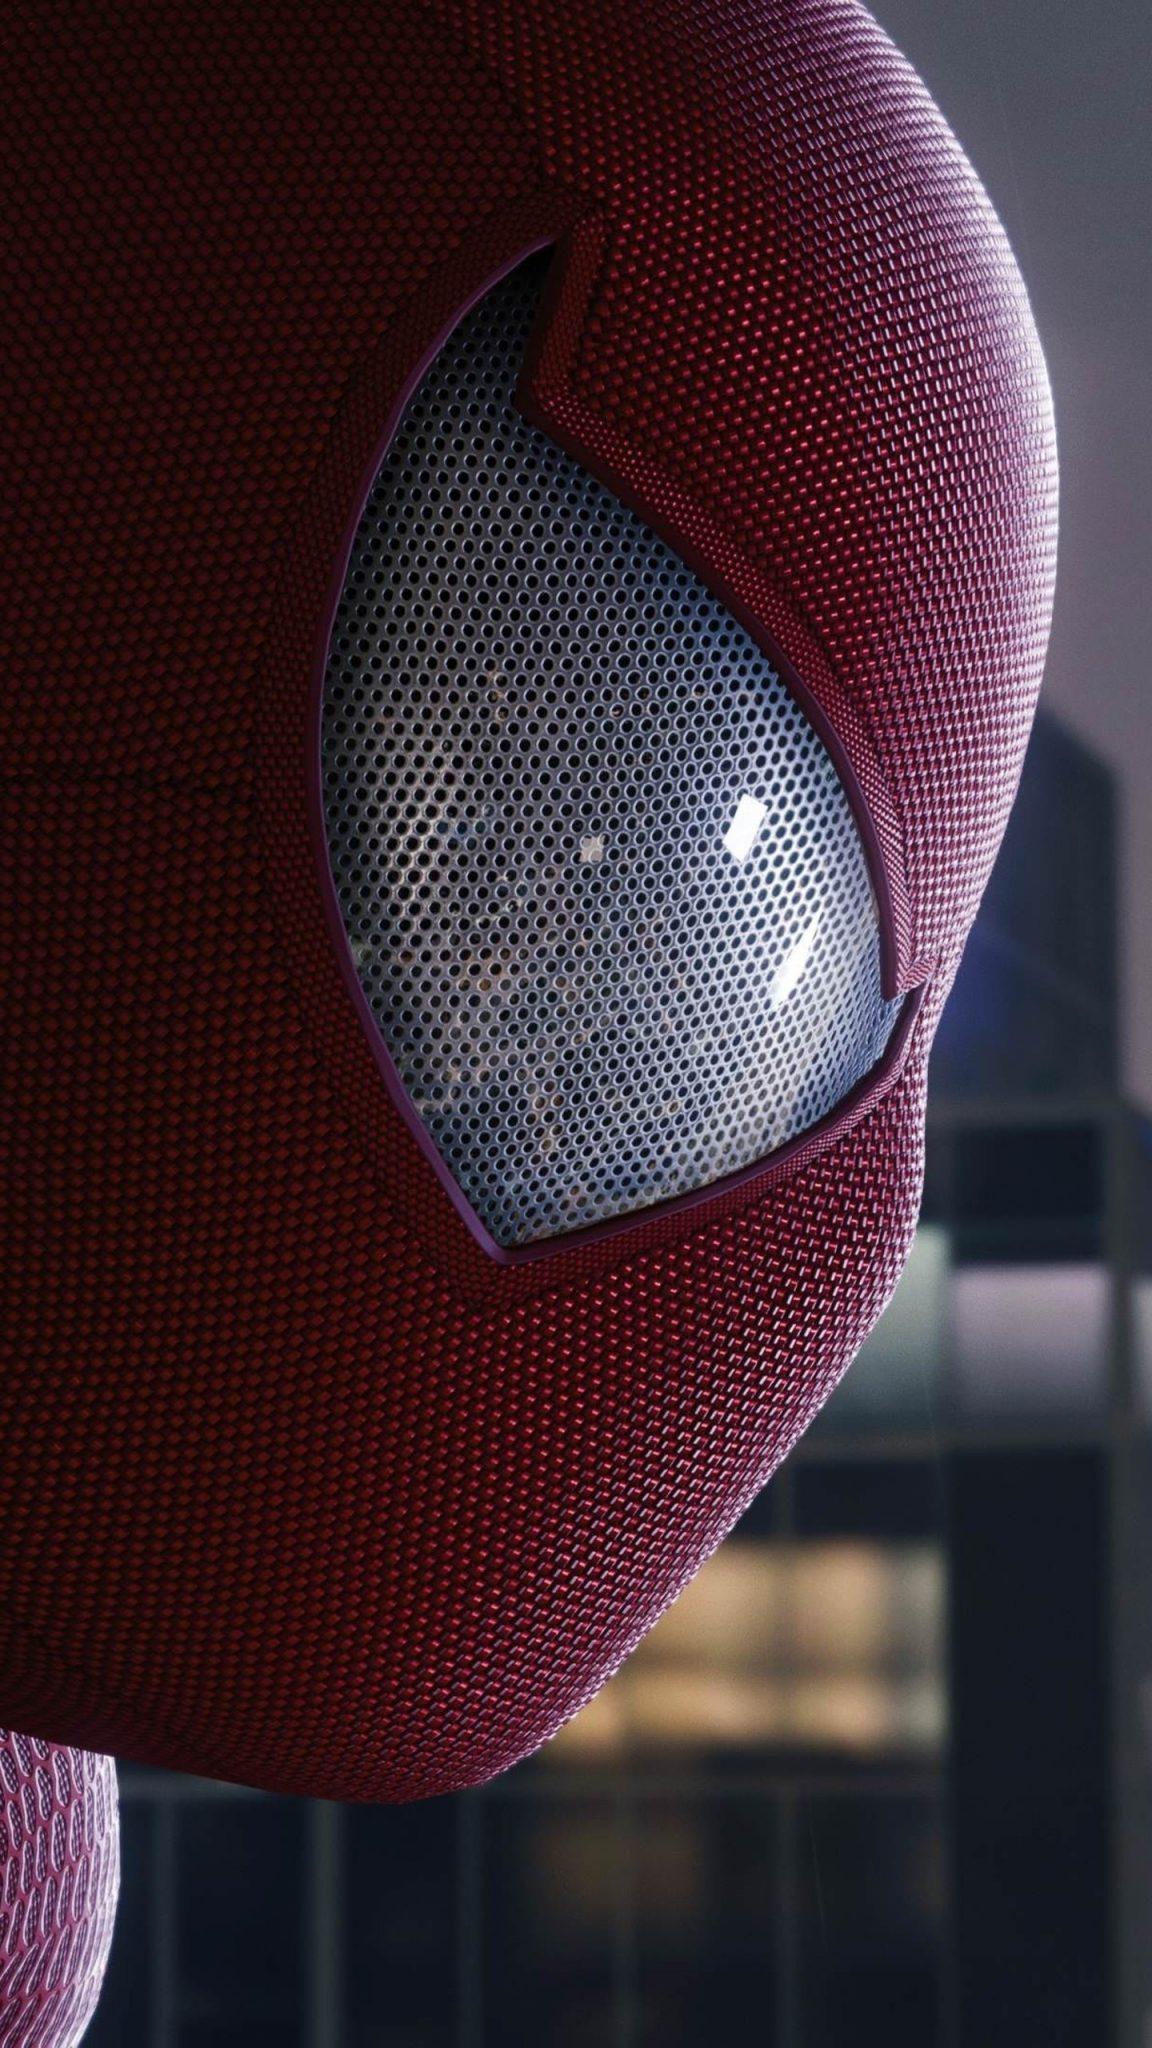 Spiderman Mask Wallpaper